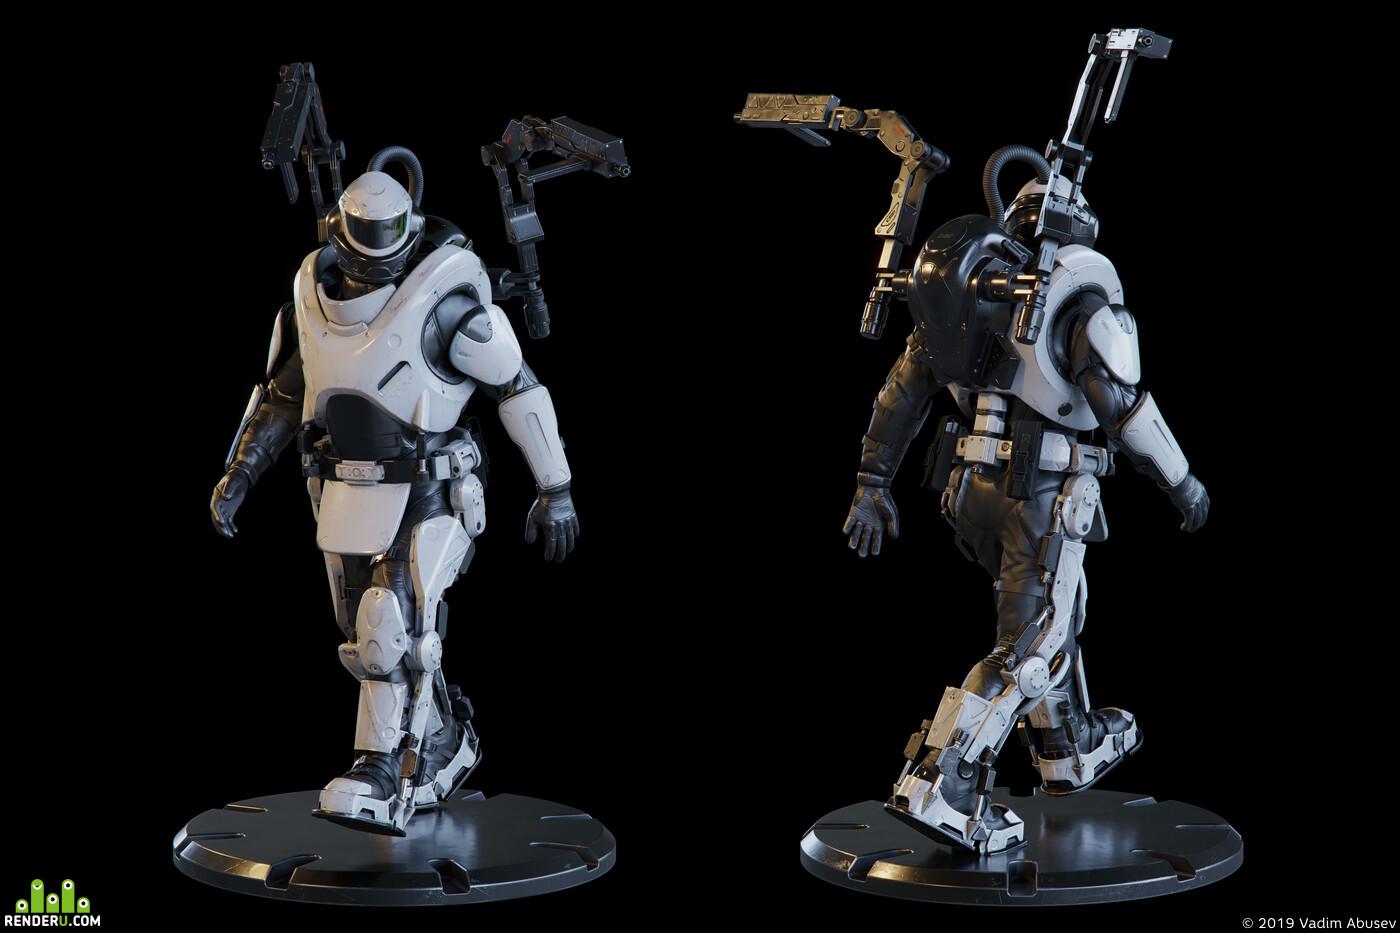 sci-fi, ratnik, Exoskeleton, suit, gun, lowpoly, PBR, military, heavy, character